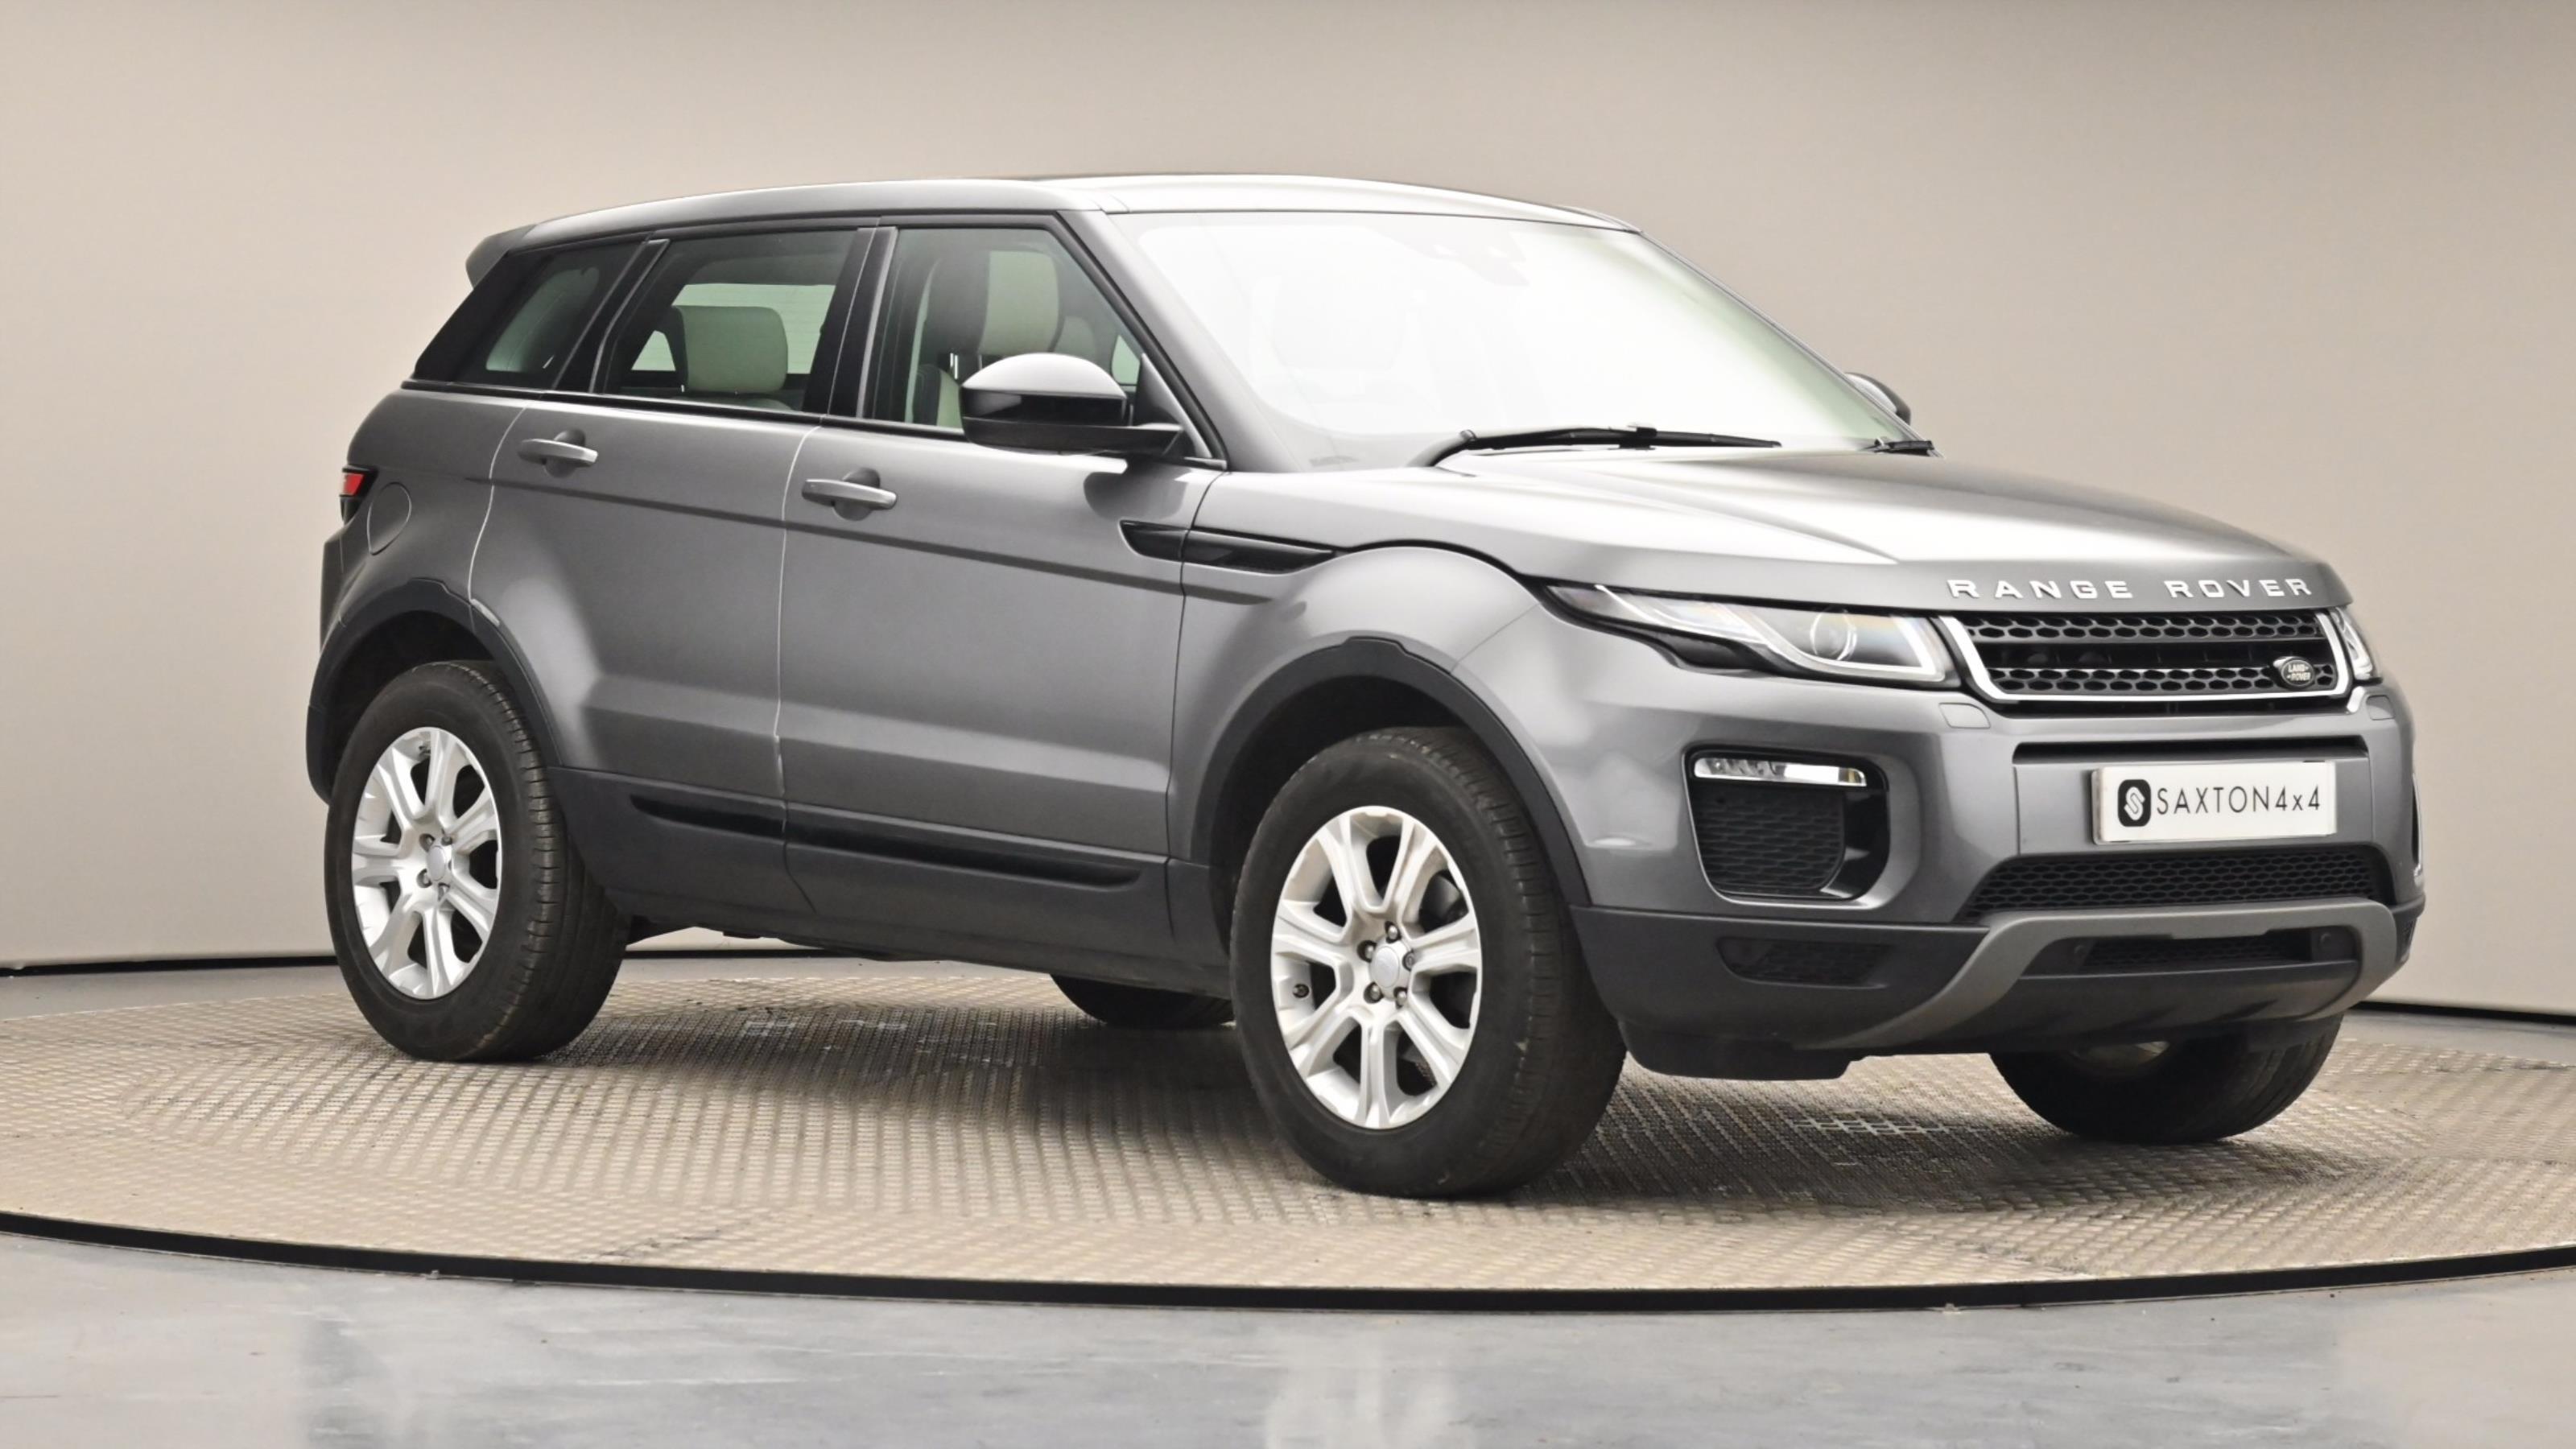 Used 16 Land Rover RANGE ROVER EVOQUE 2.0 eD4 SE Tech 5dr 2WD GREY at Saxton4x4